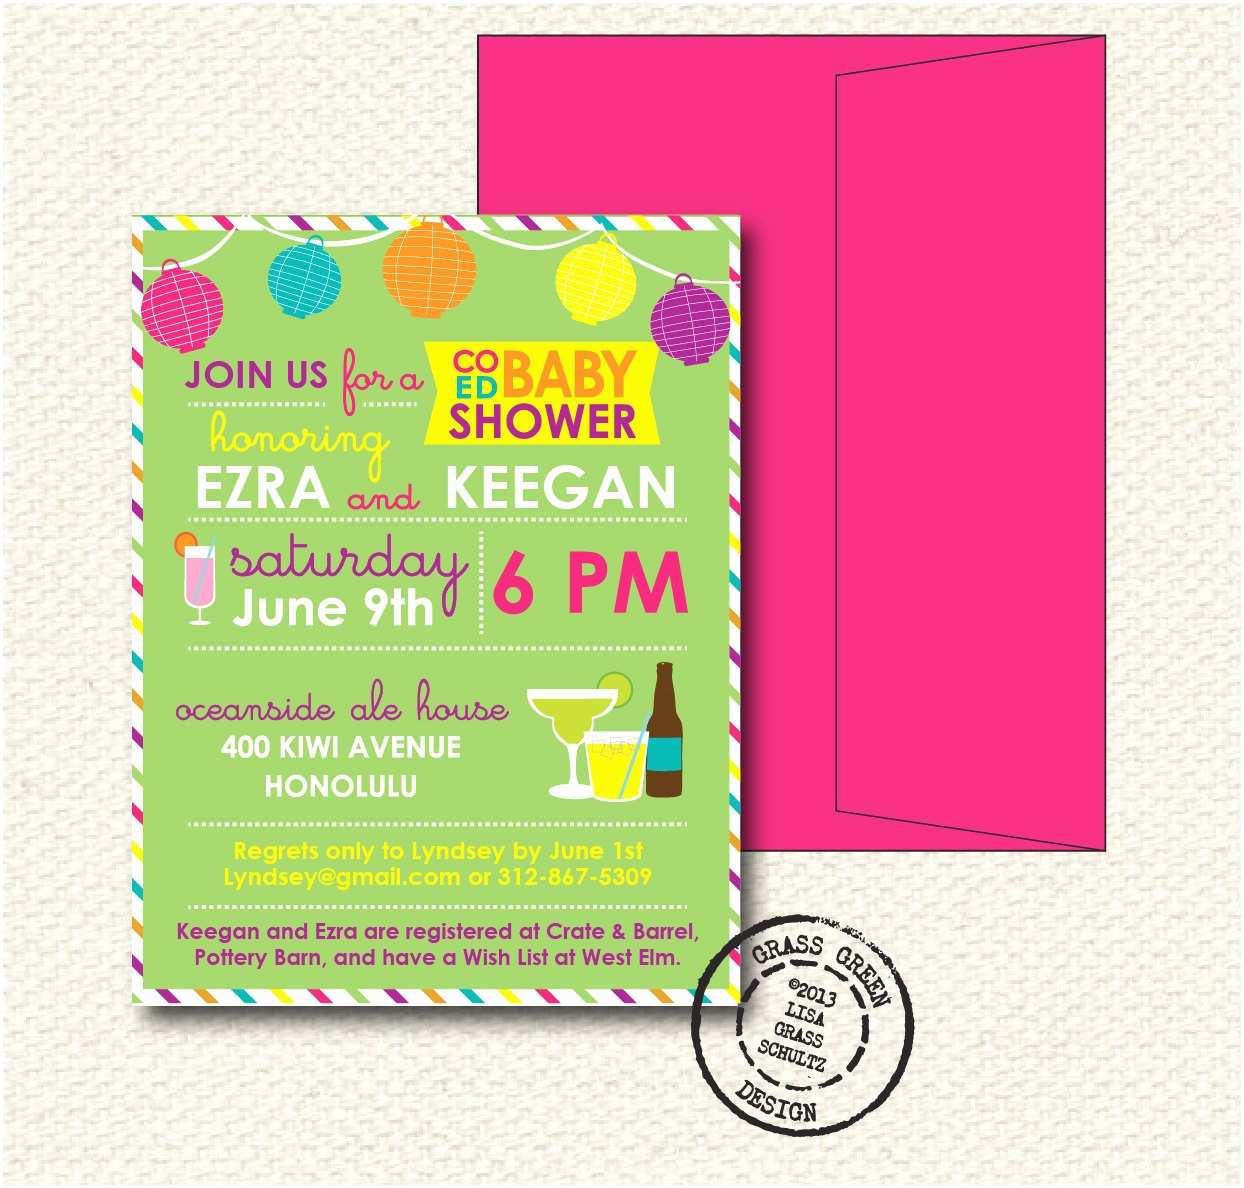 Coed Baby Shower Invitations Coed Baby Shower Invitation 15 Custom Invitations with